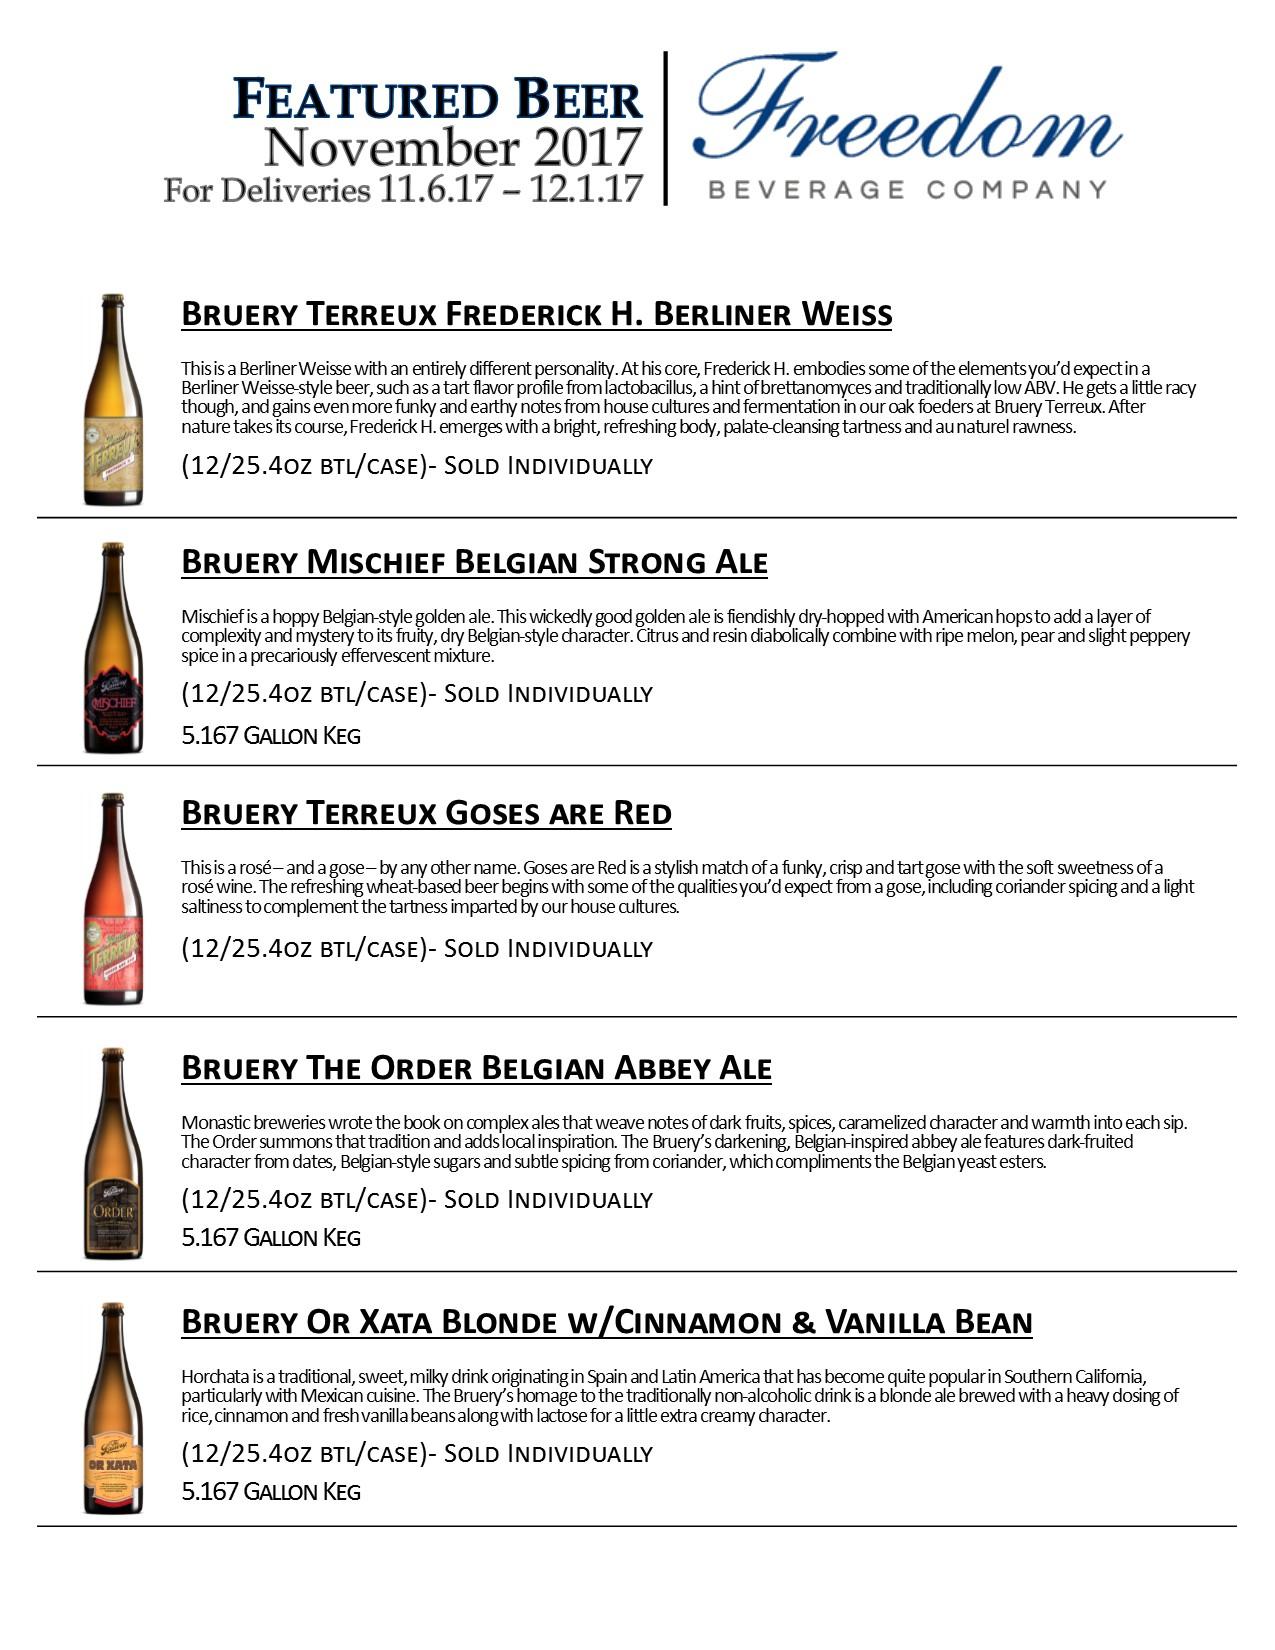 November 2017 Featured Beer - WEBSITE.jpg